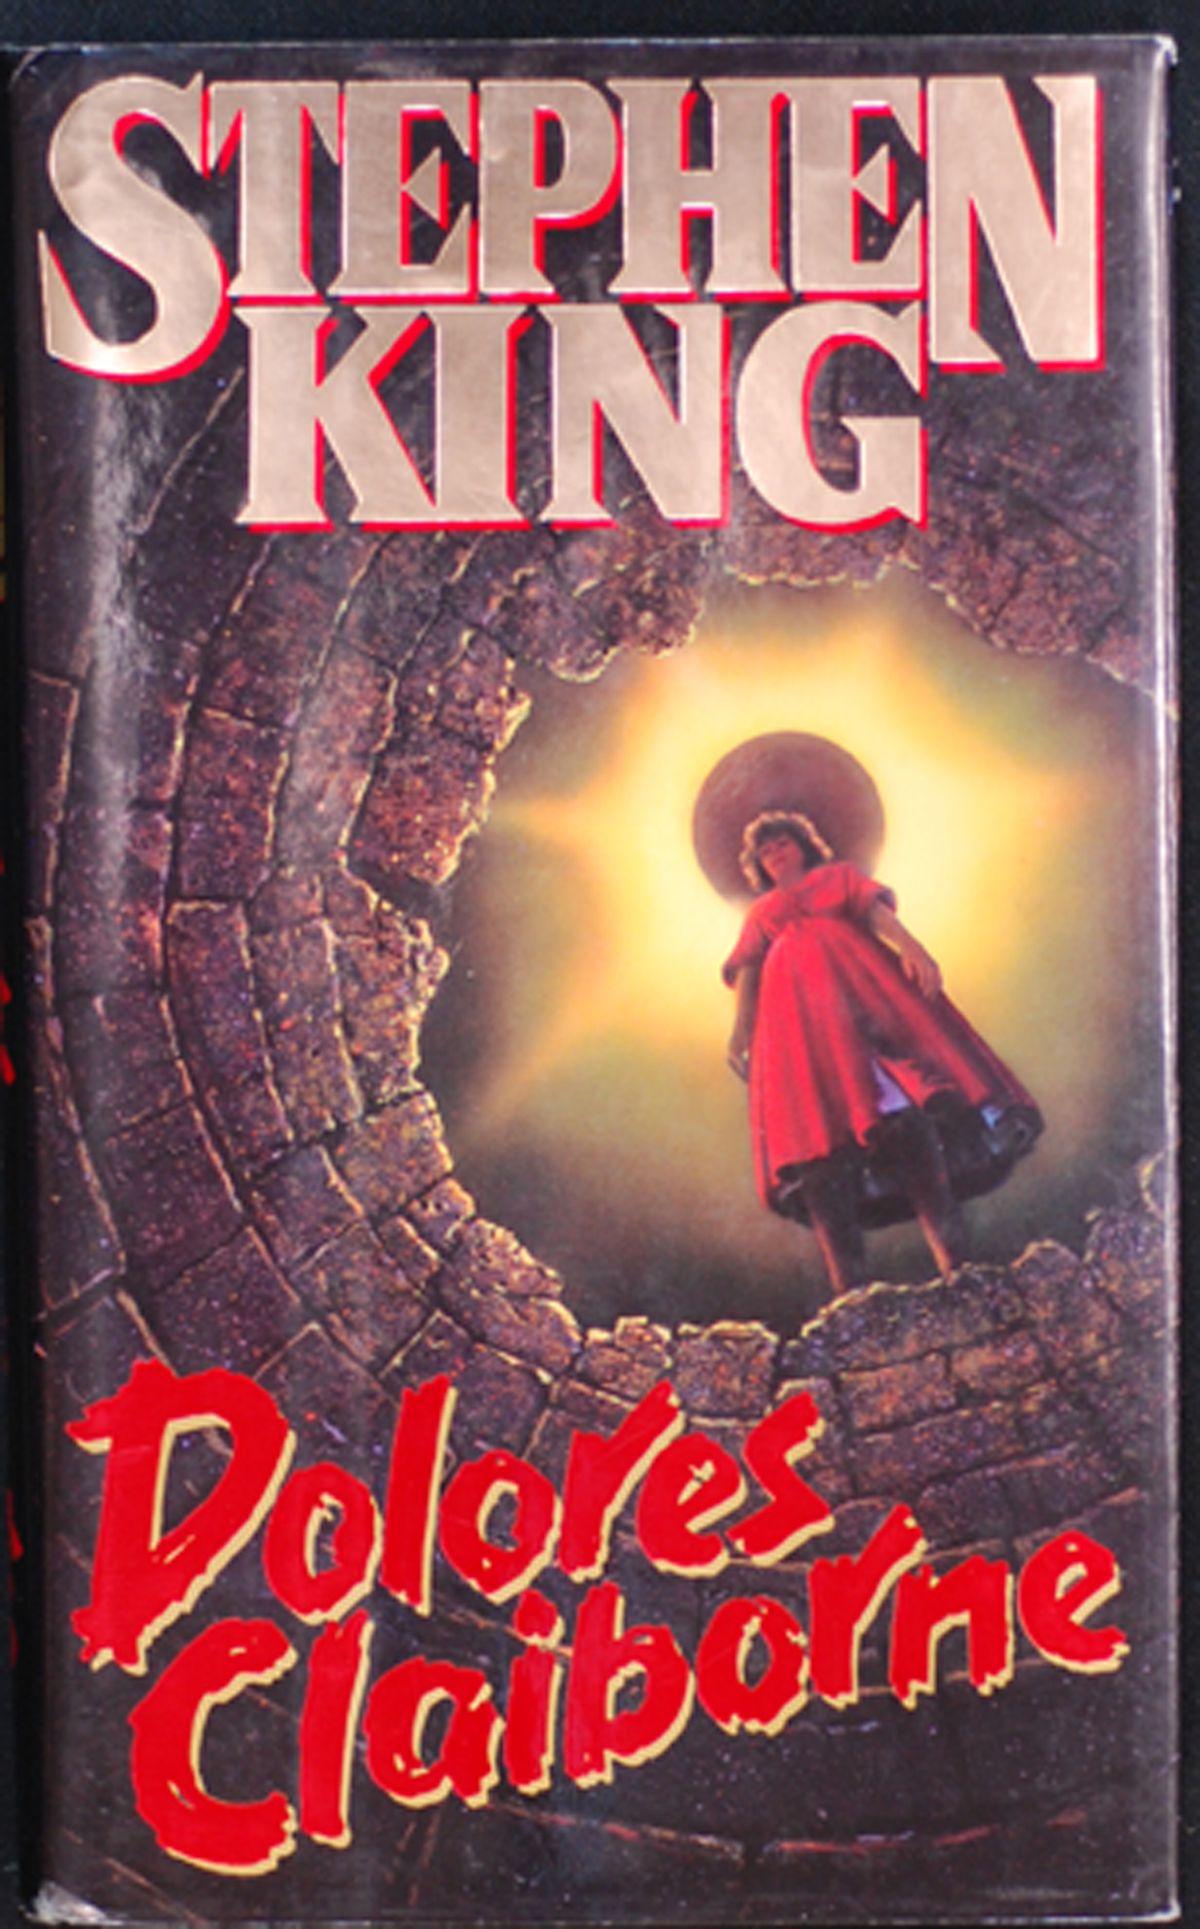 King Stephen Dolores Claiborne 1992 Stephen King Books Stephen King Dolores Claiborne